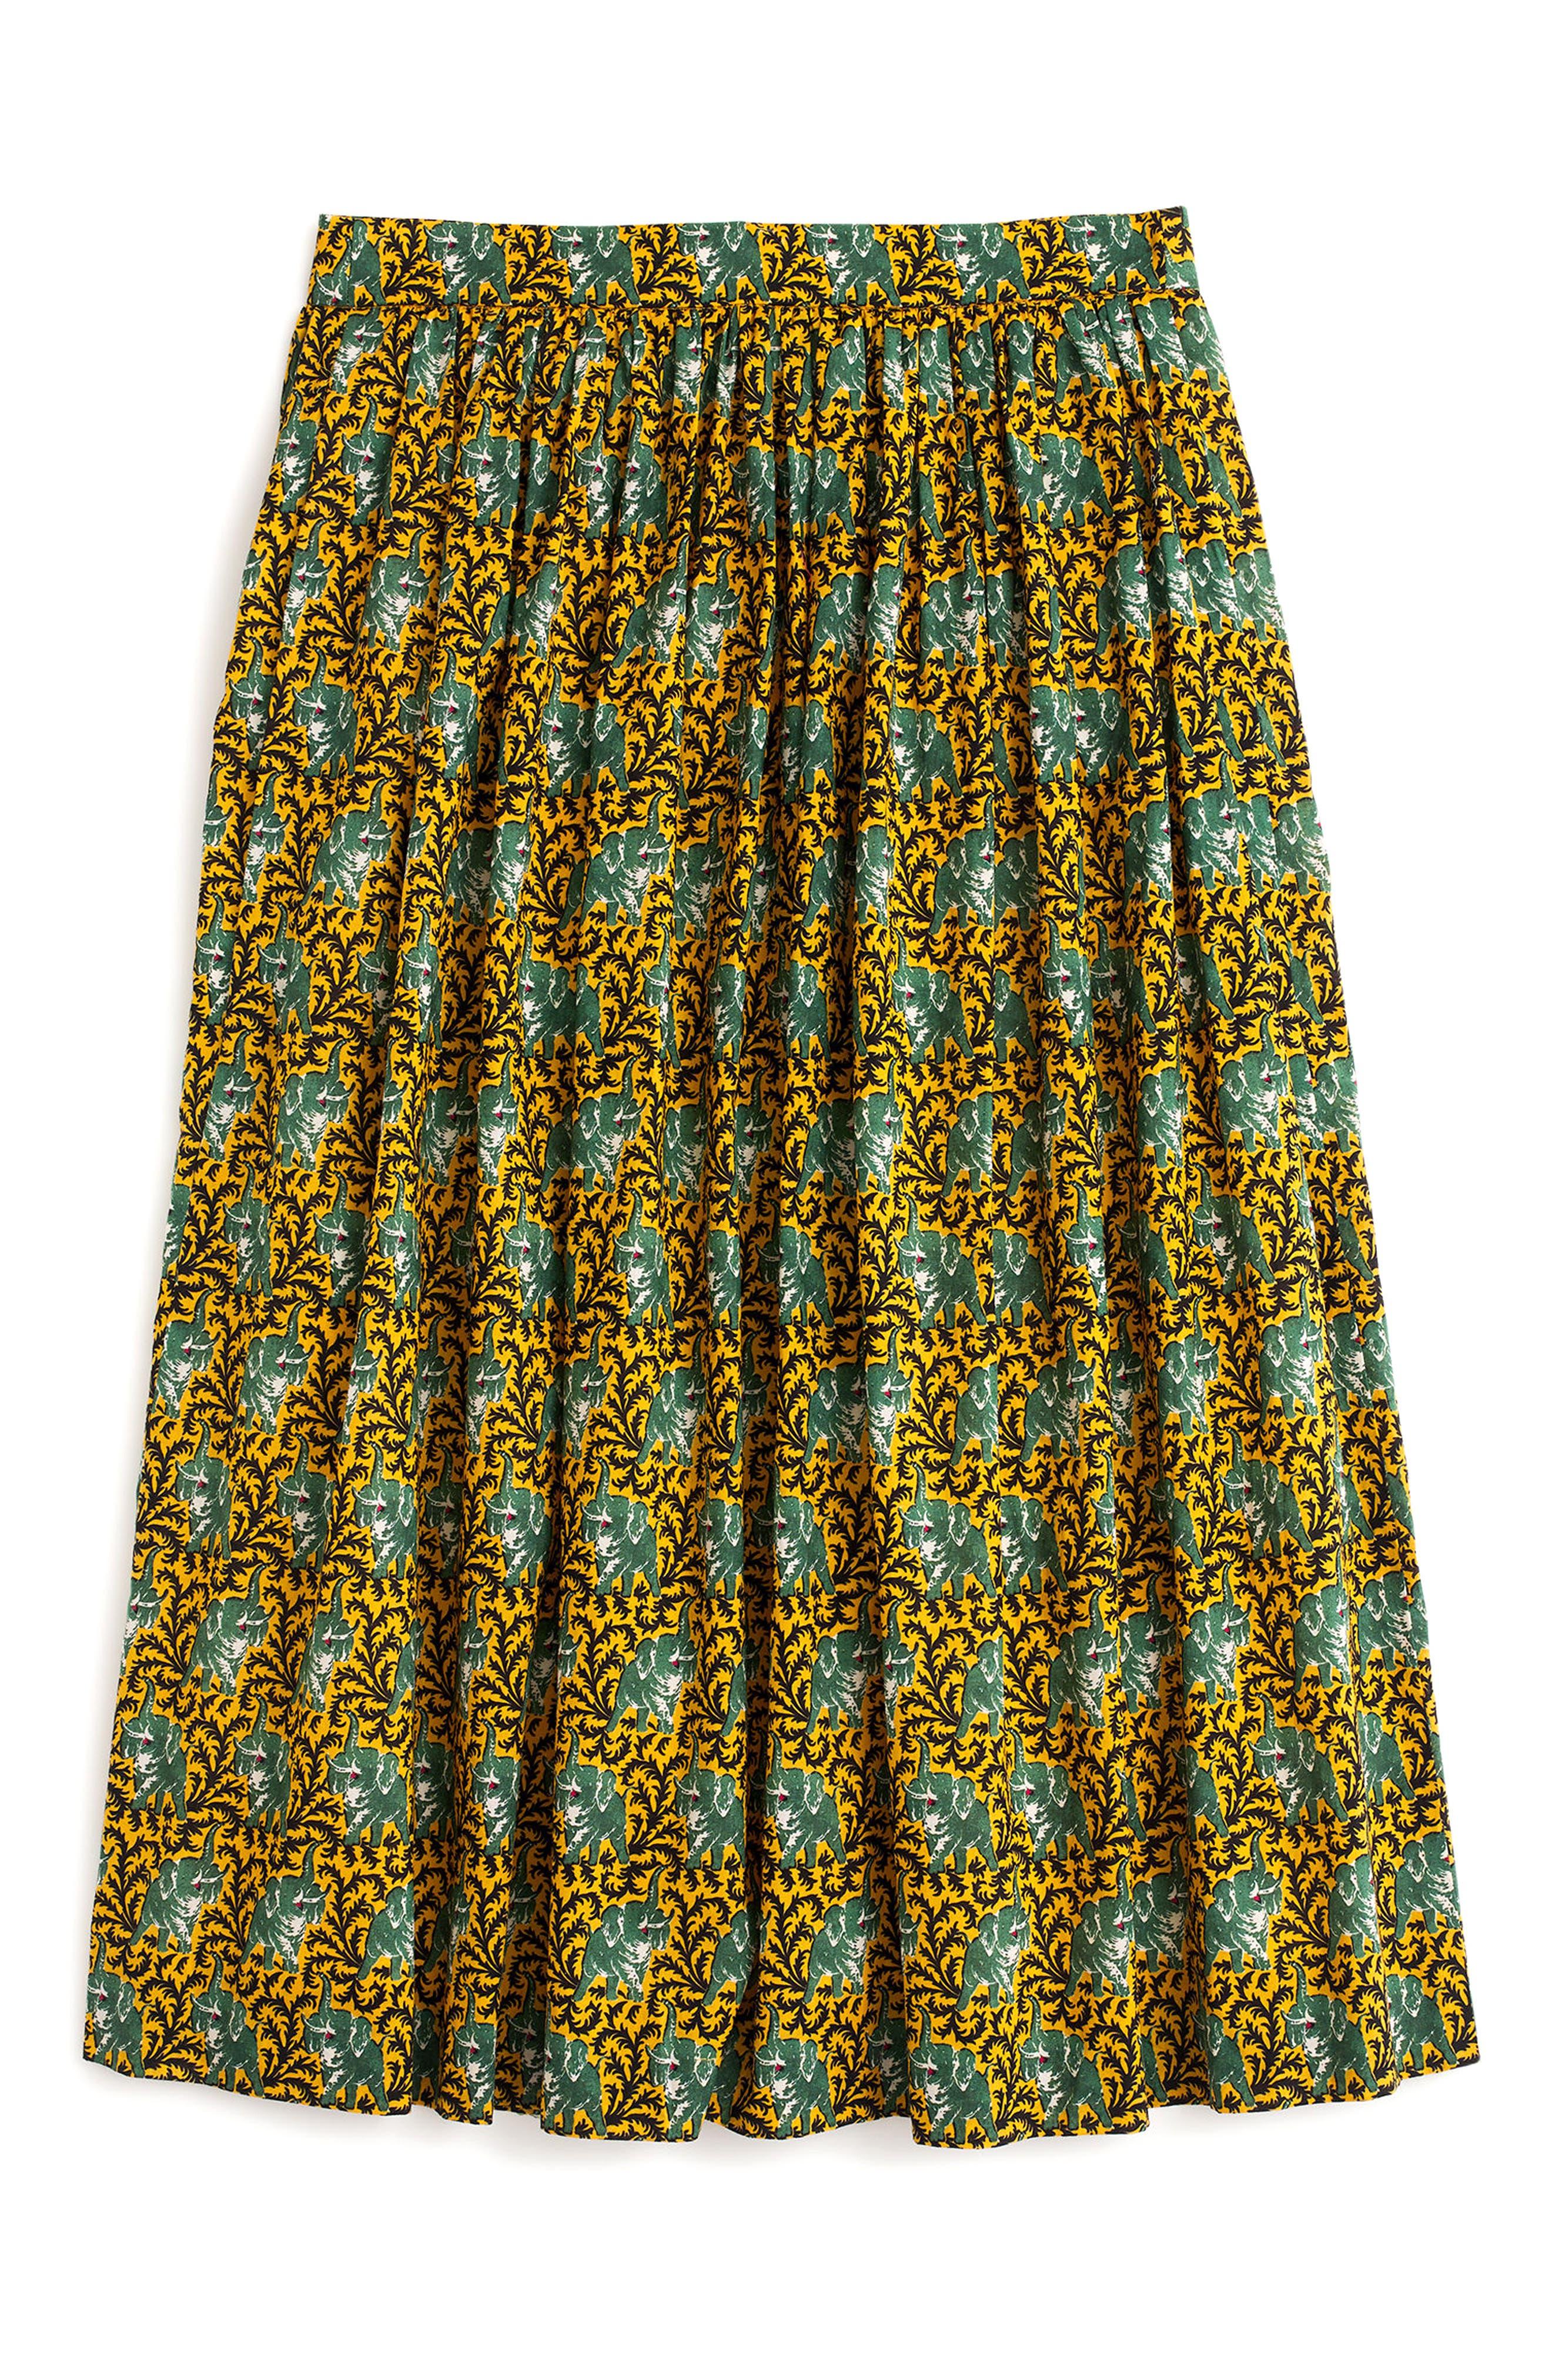 J.Crew Elephant Print Skirt,                             Alternate thumbnail 4, color,                             Dark Curry